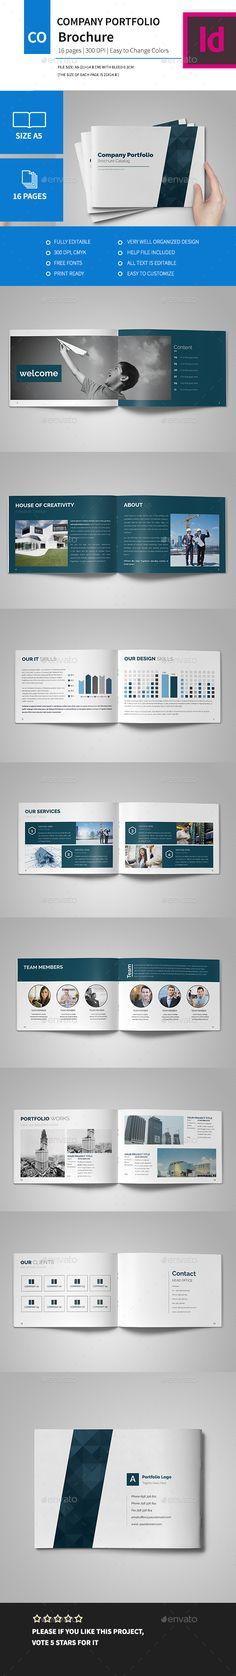 PT Nova Surya Sejahtera Company Profile Website Portfolio - profile company template